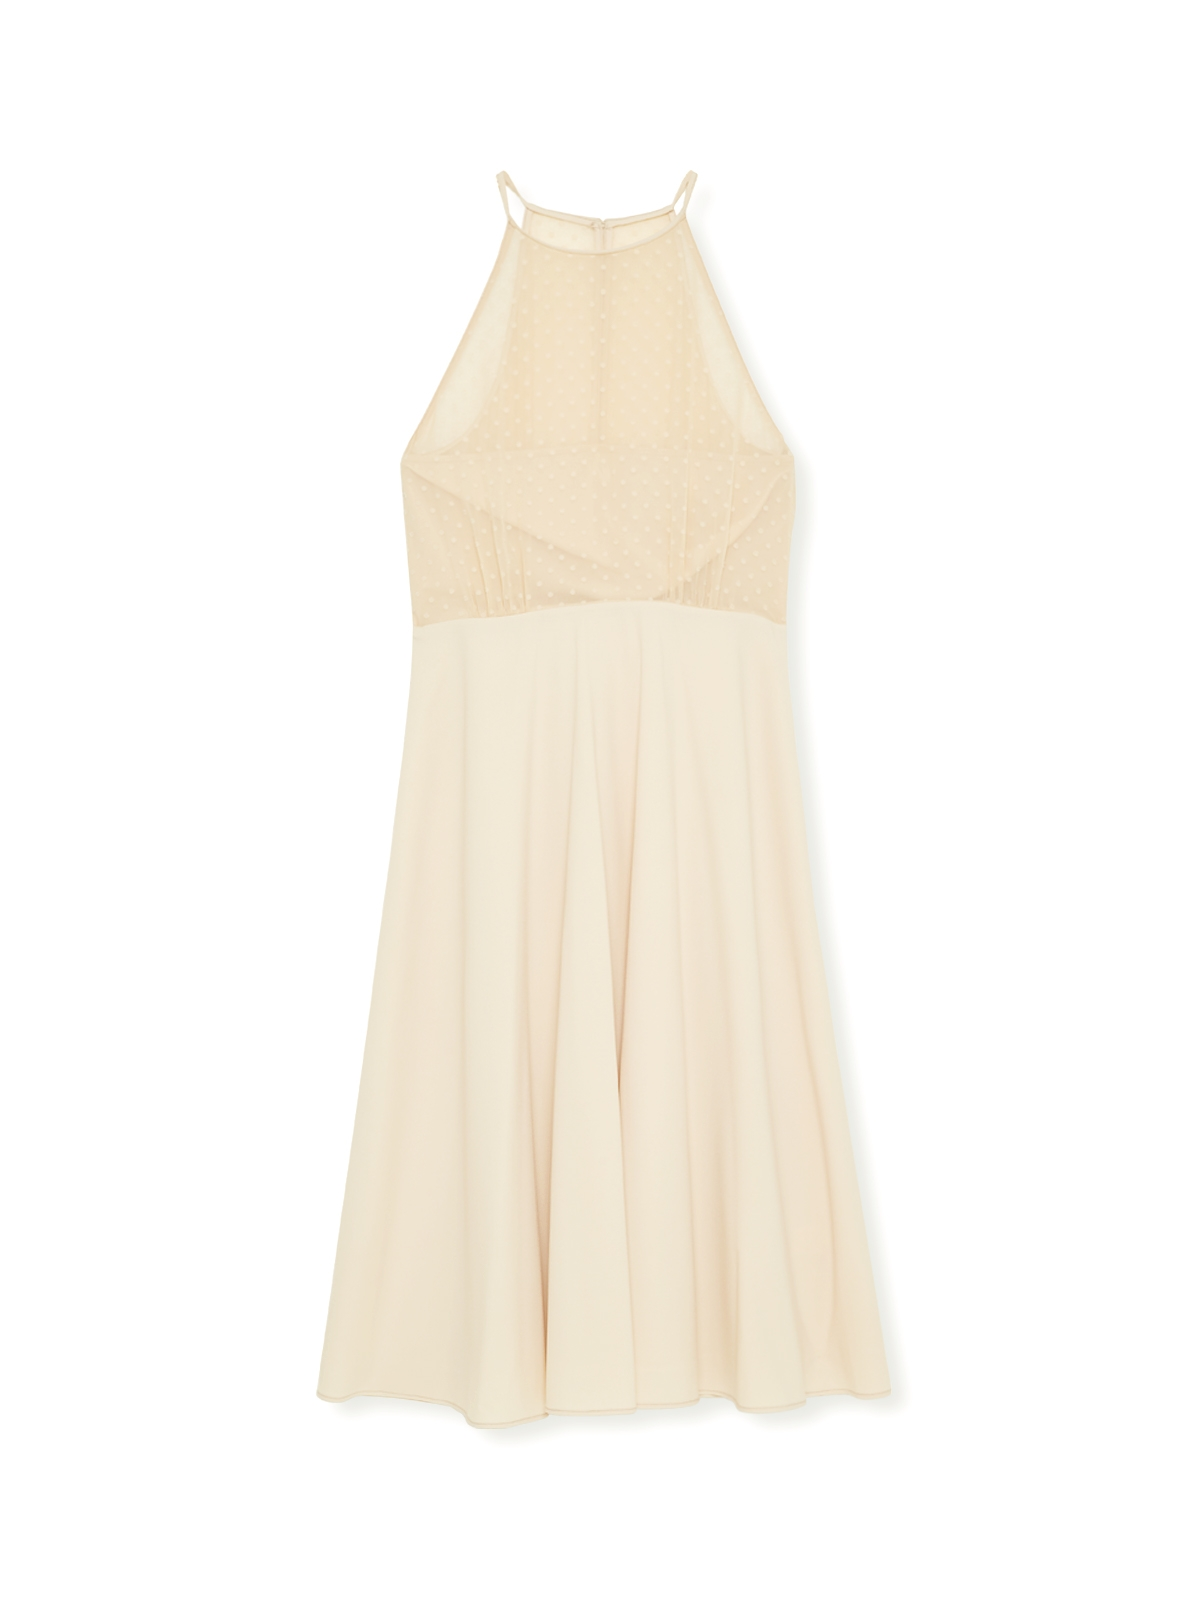 Polka Dot Lace Halter Dress Cream